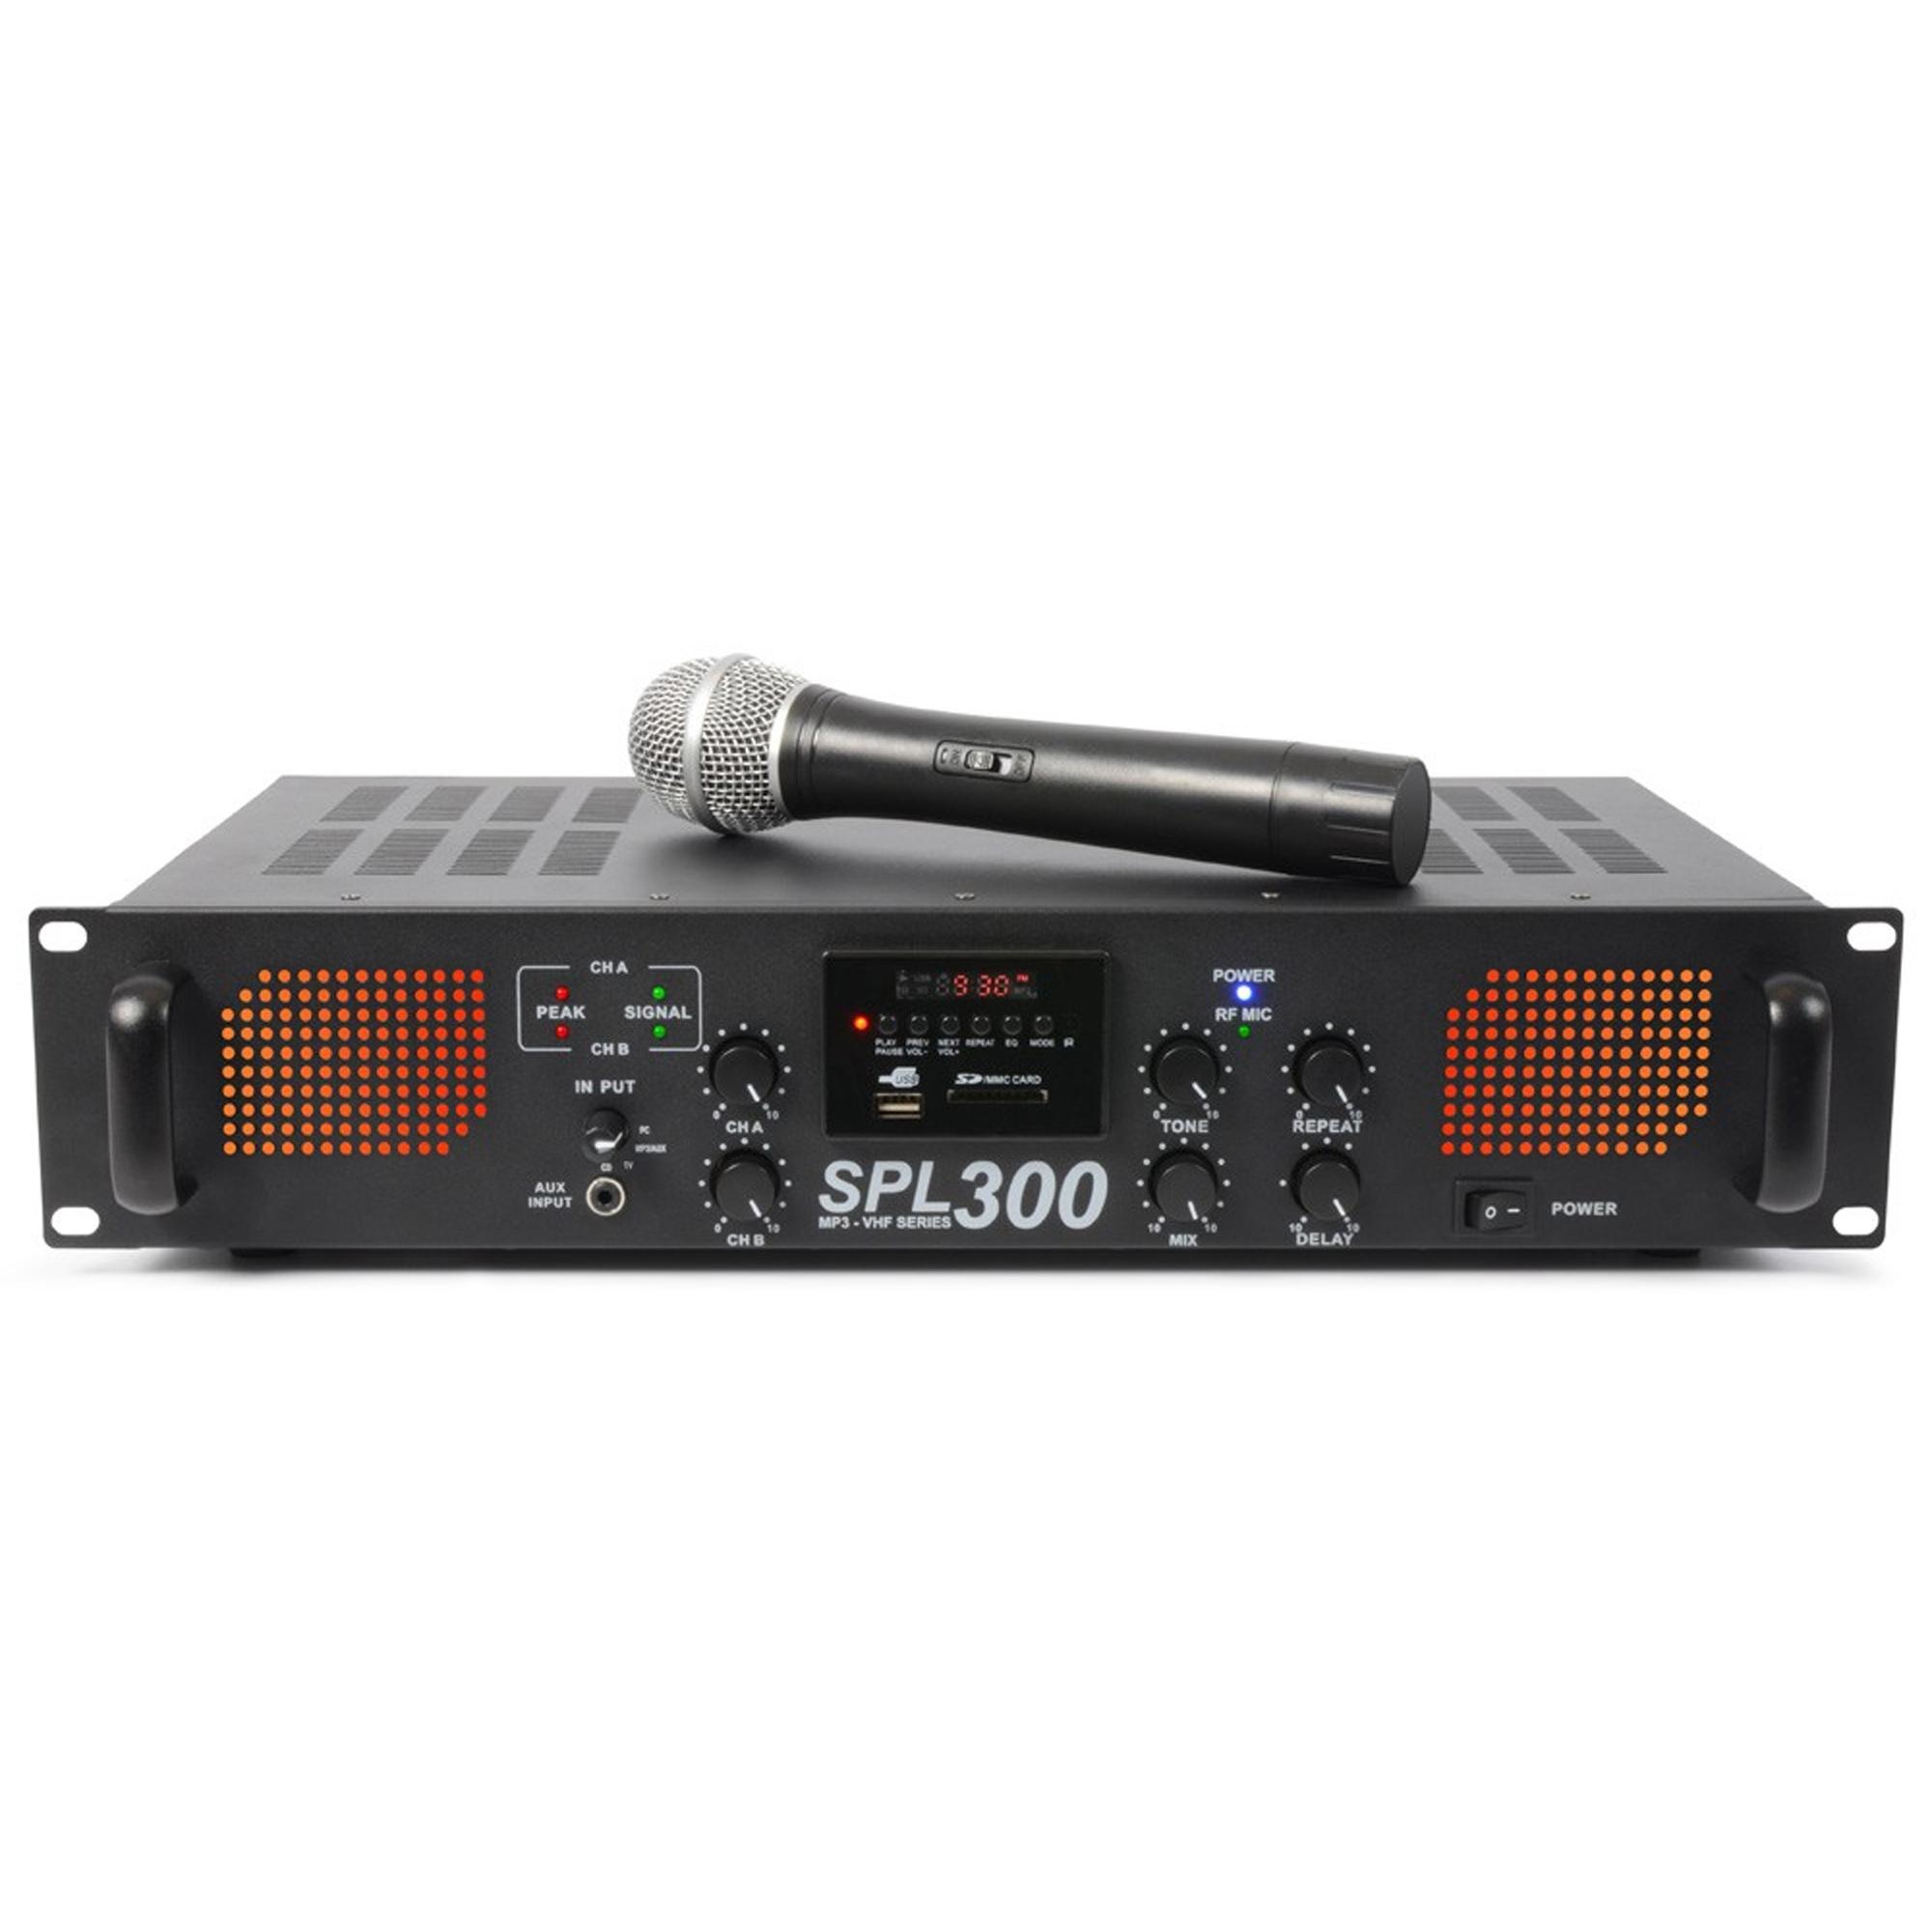 Skytec SPL-300VHF 2-Channel Power Amplifier with Wireless Microphone